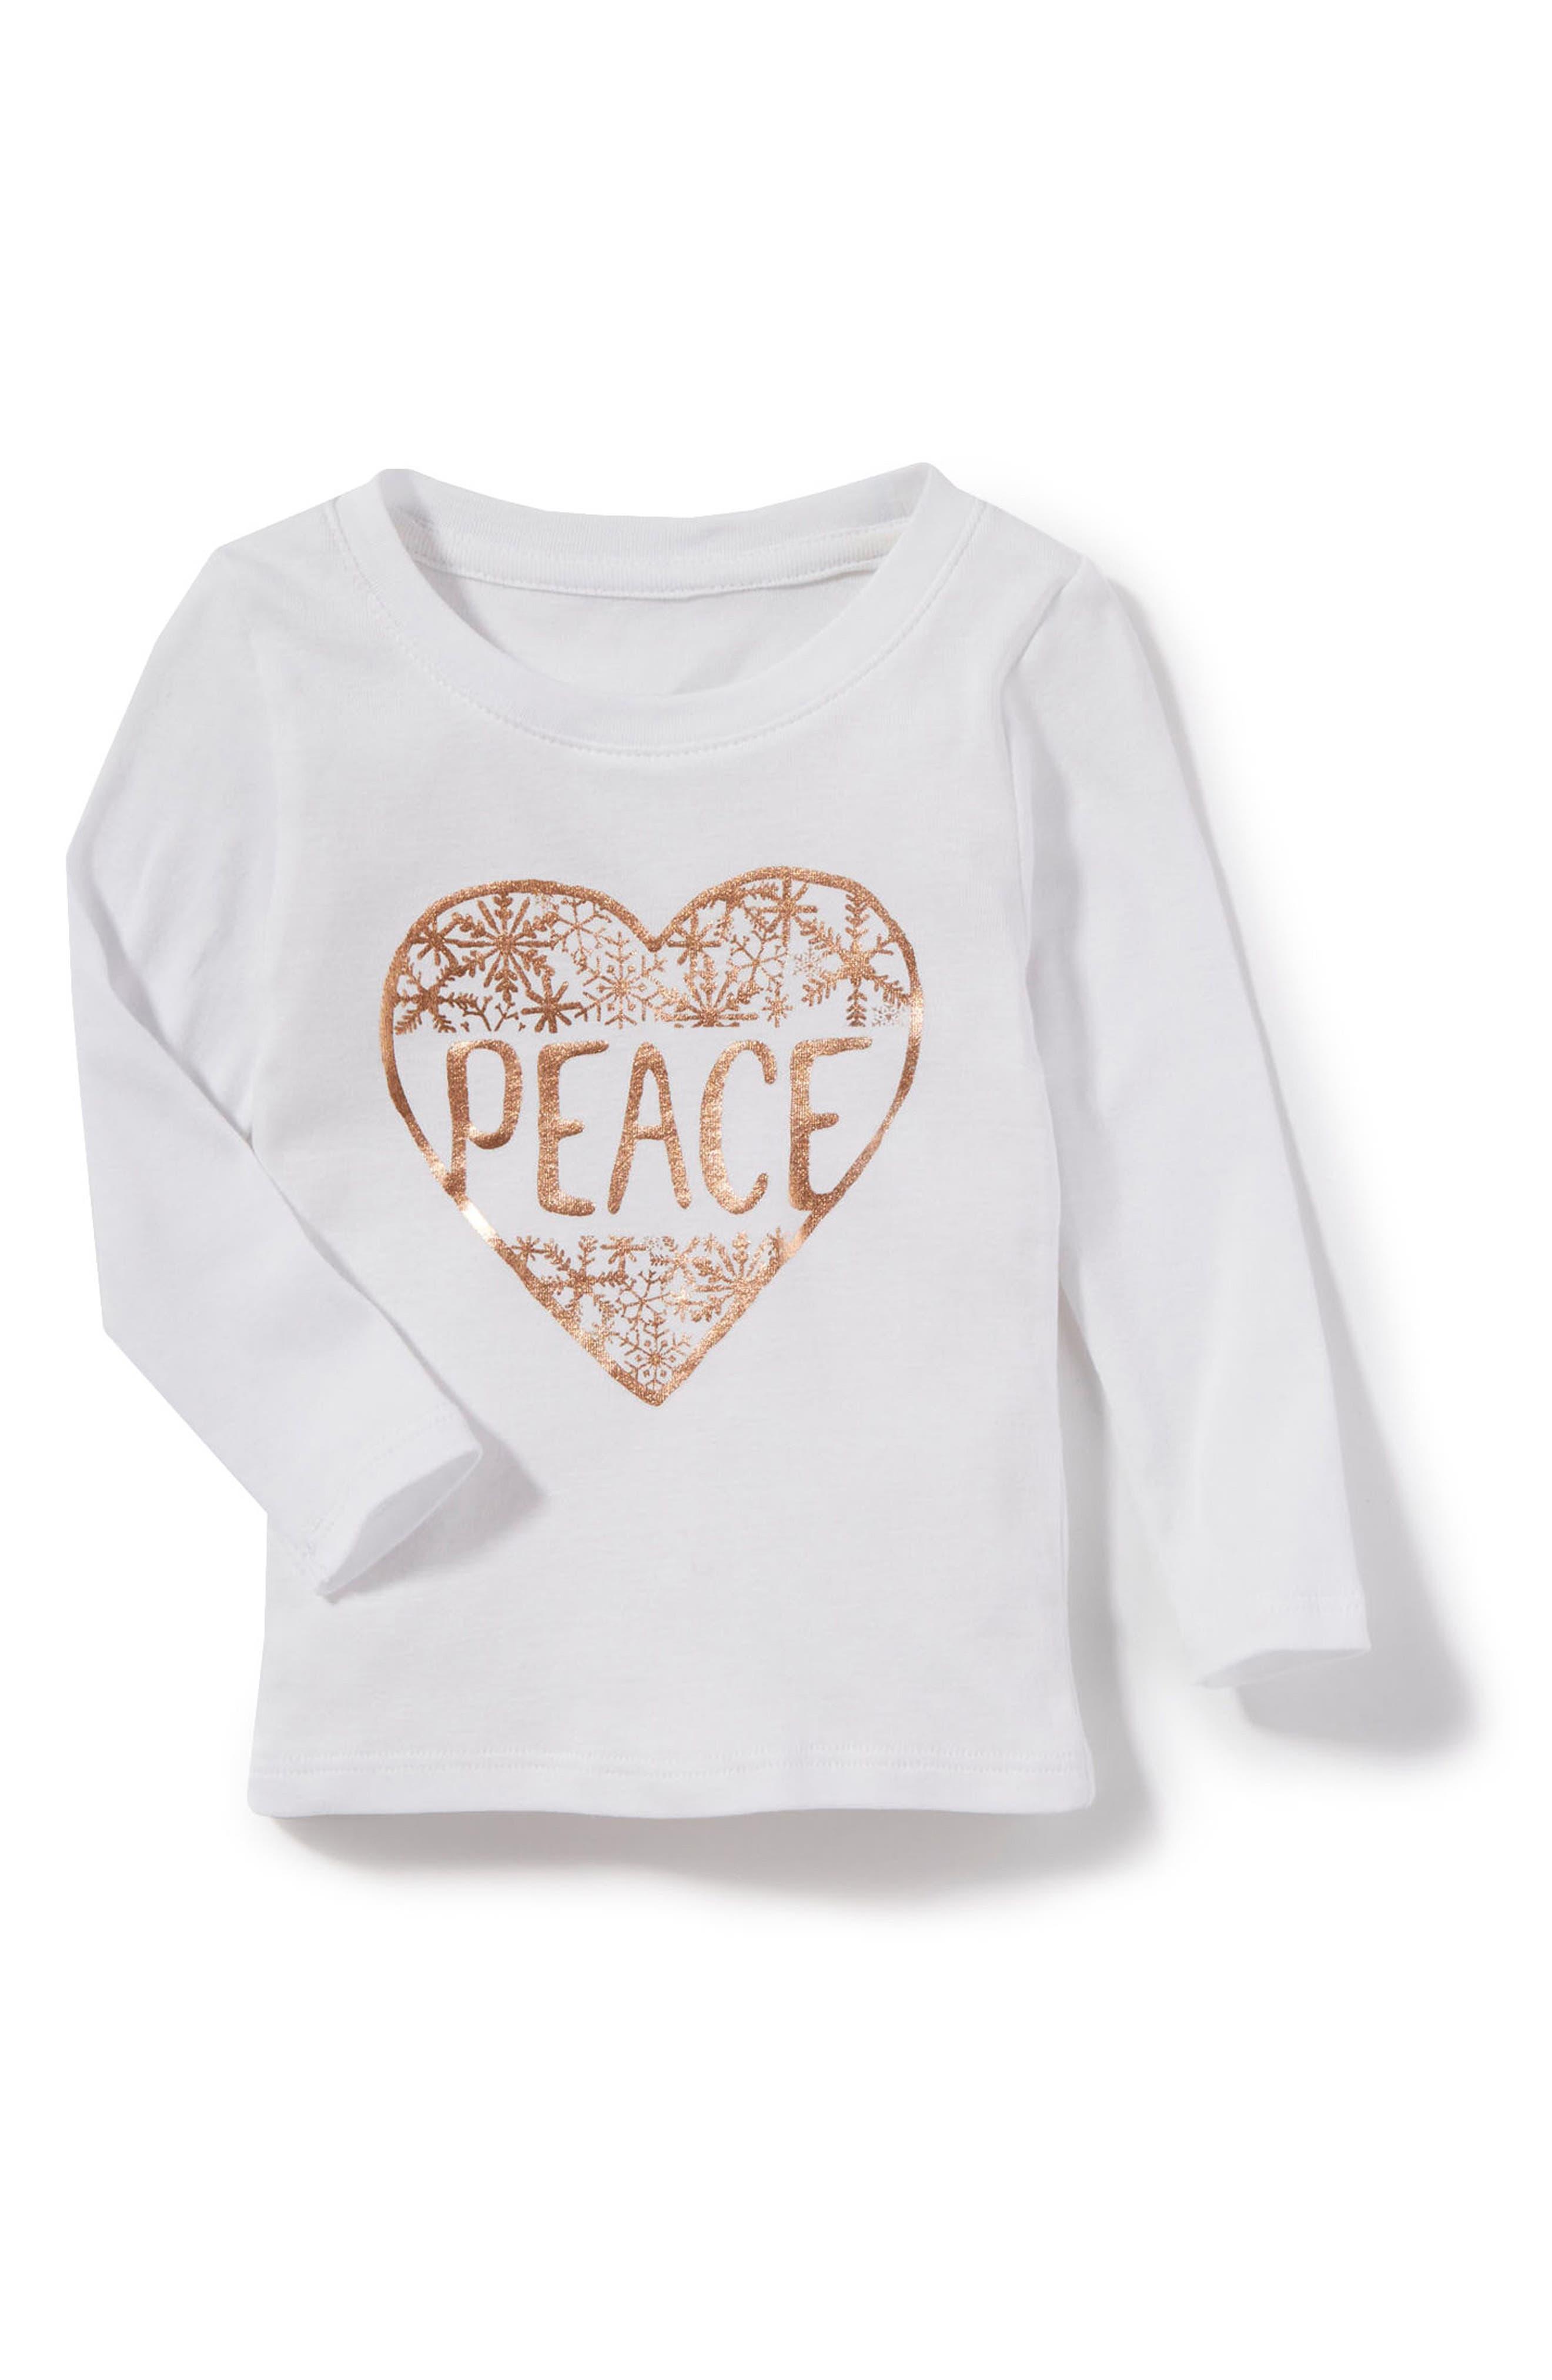 Peek Peace Graphic Tee (Baby Girls)